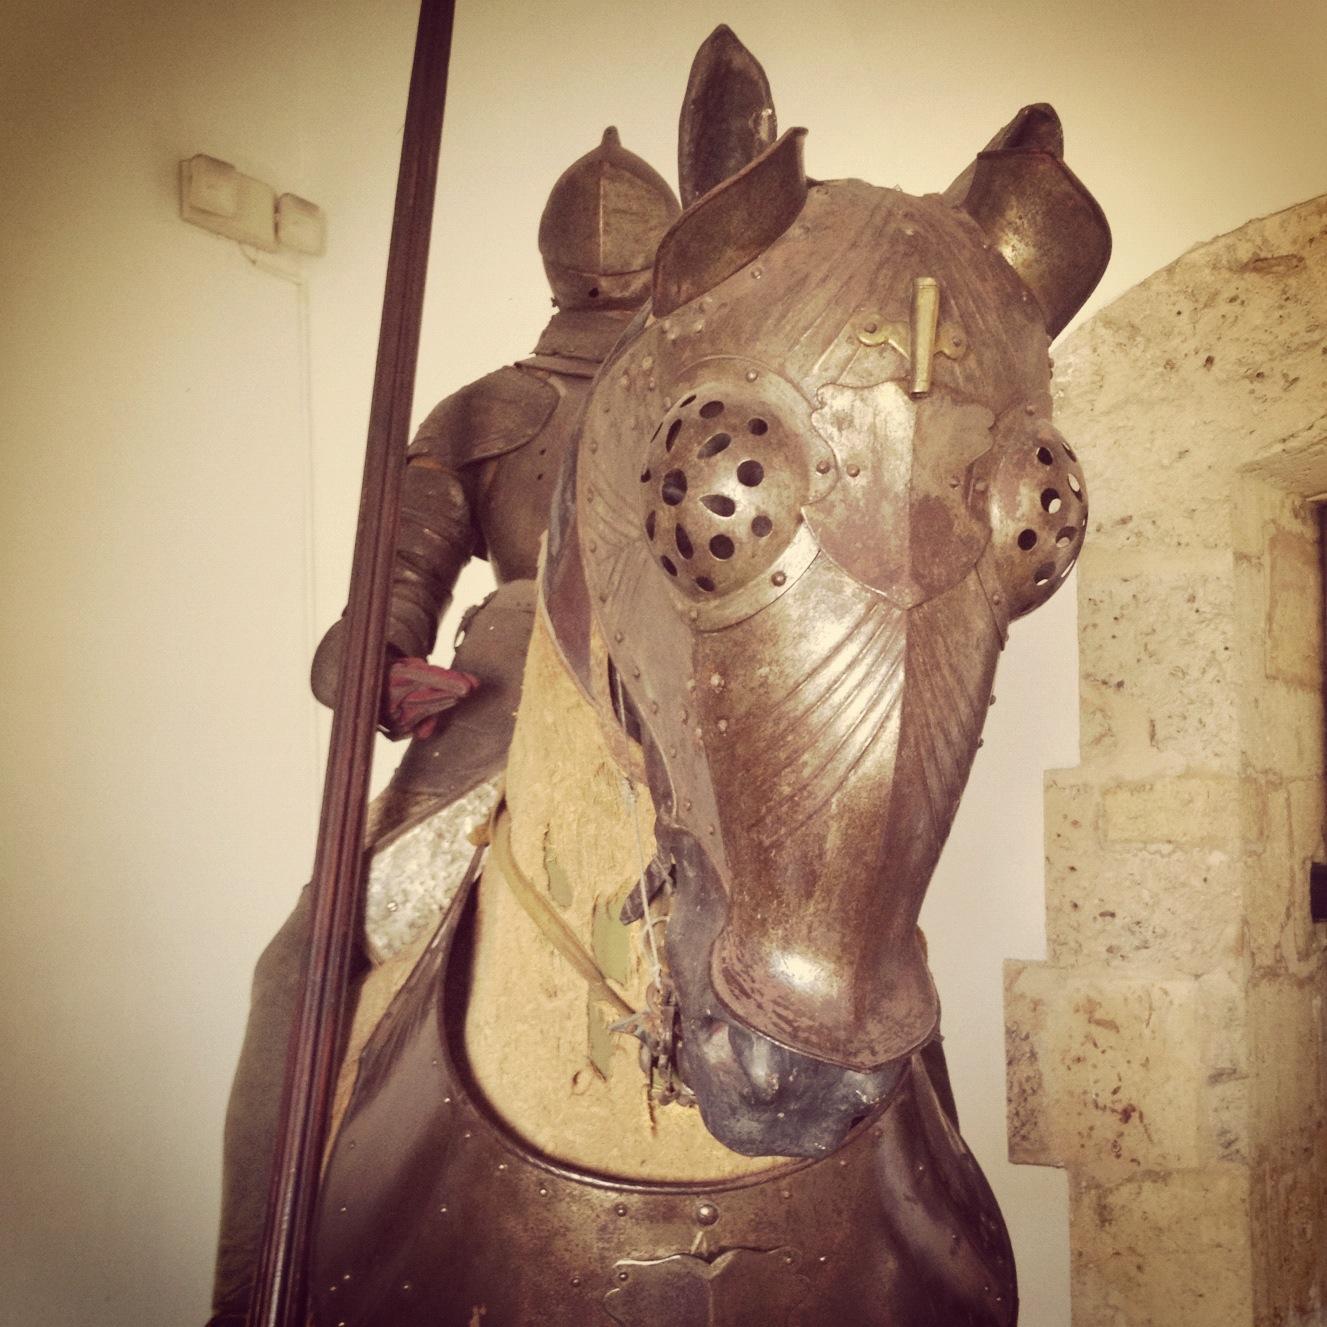 Christopher Columbus' Spanish horse armor